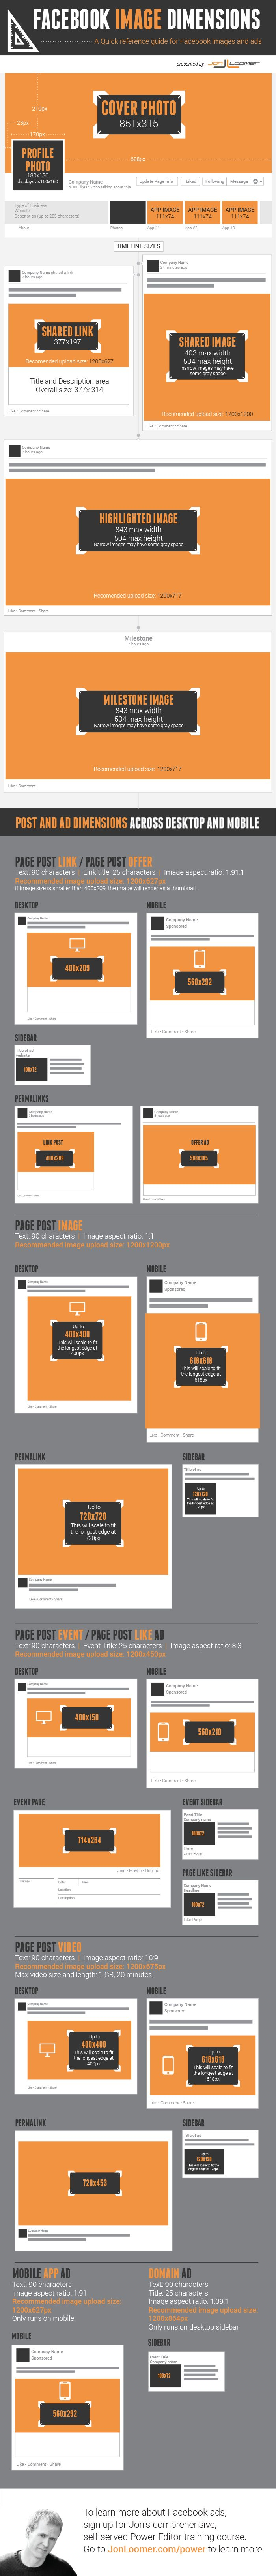 Facebook Bildgrößen: Seiten, Mobile, News Feed & Anzeigen [Infografik]